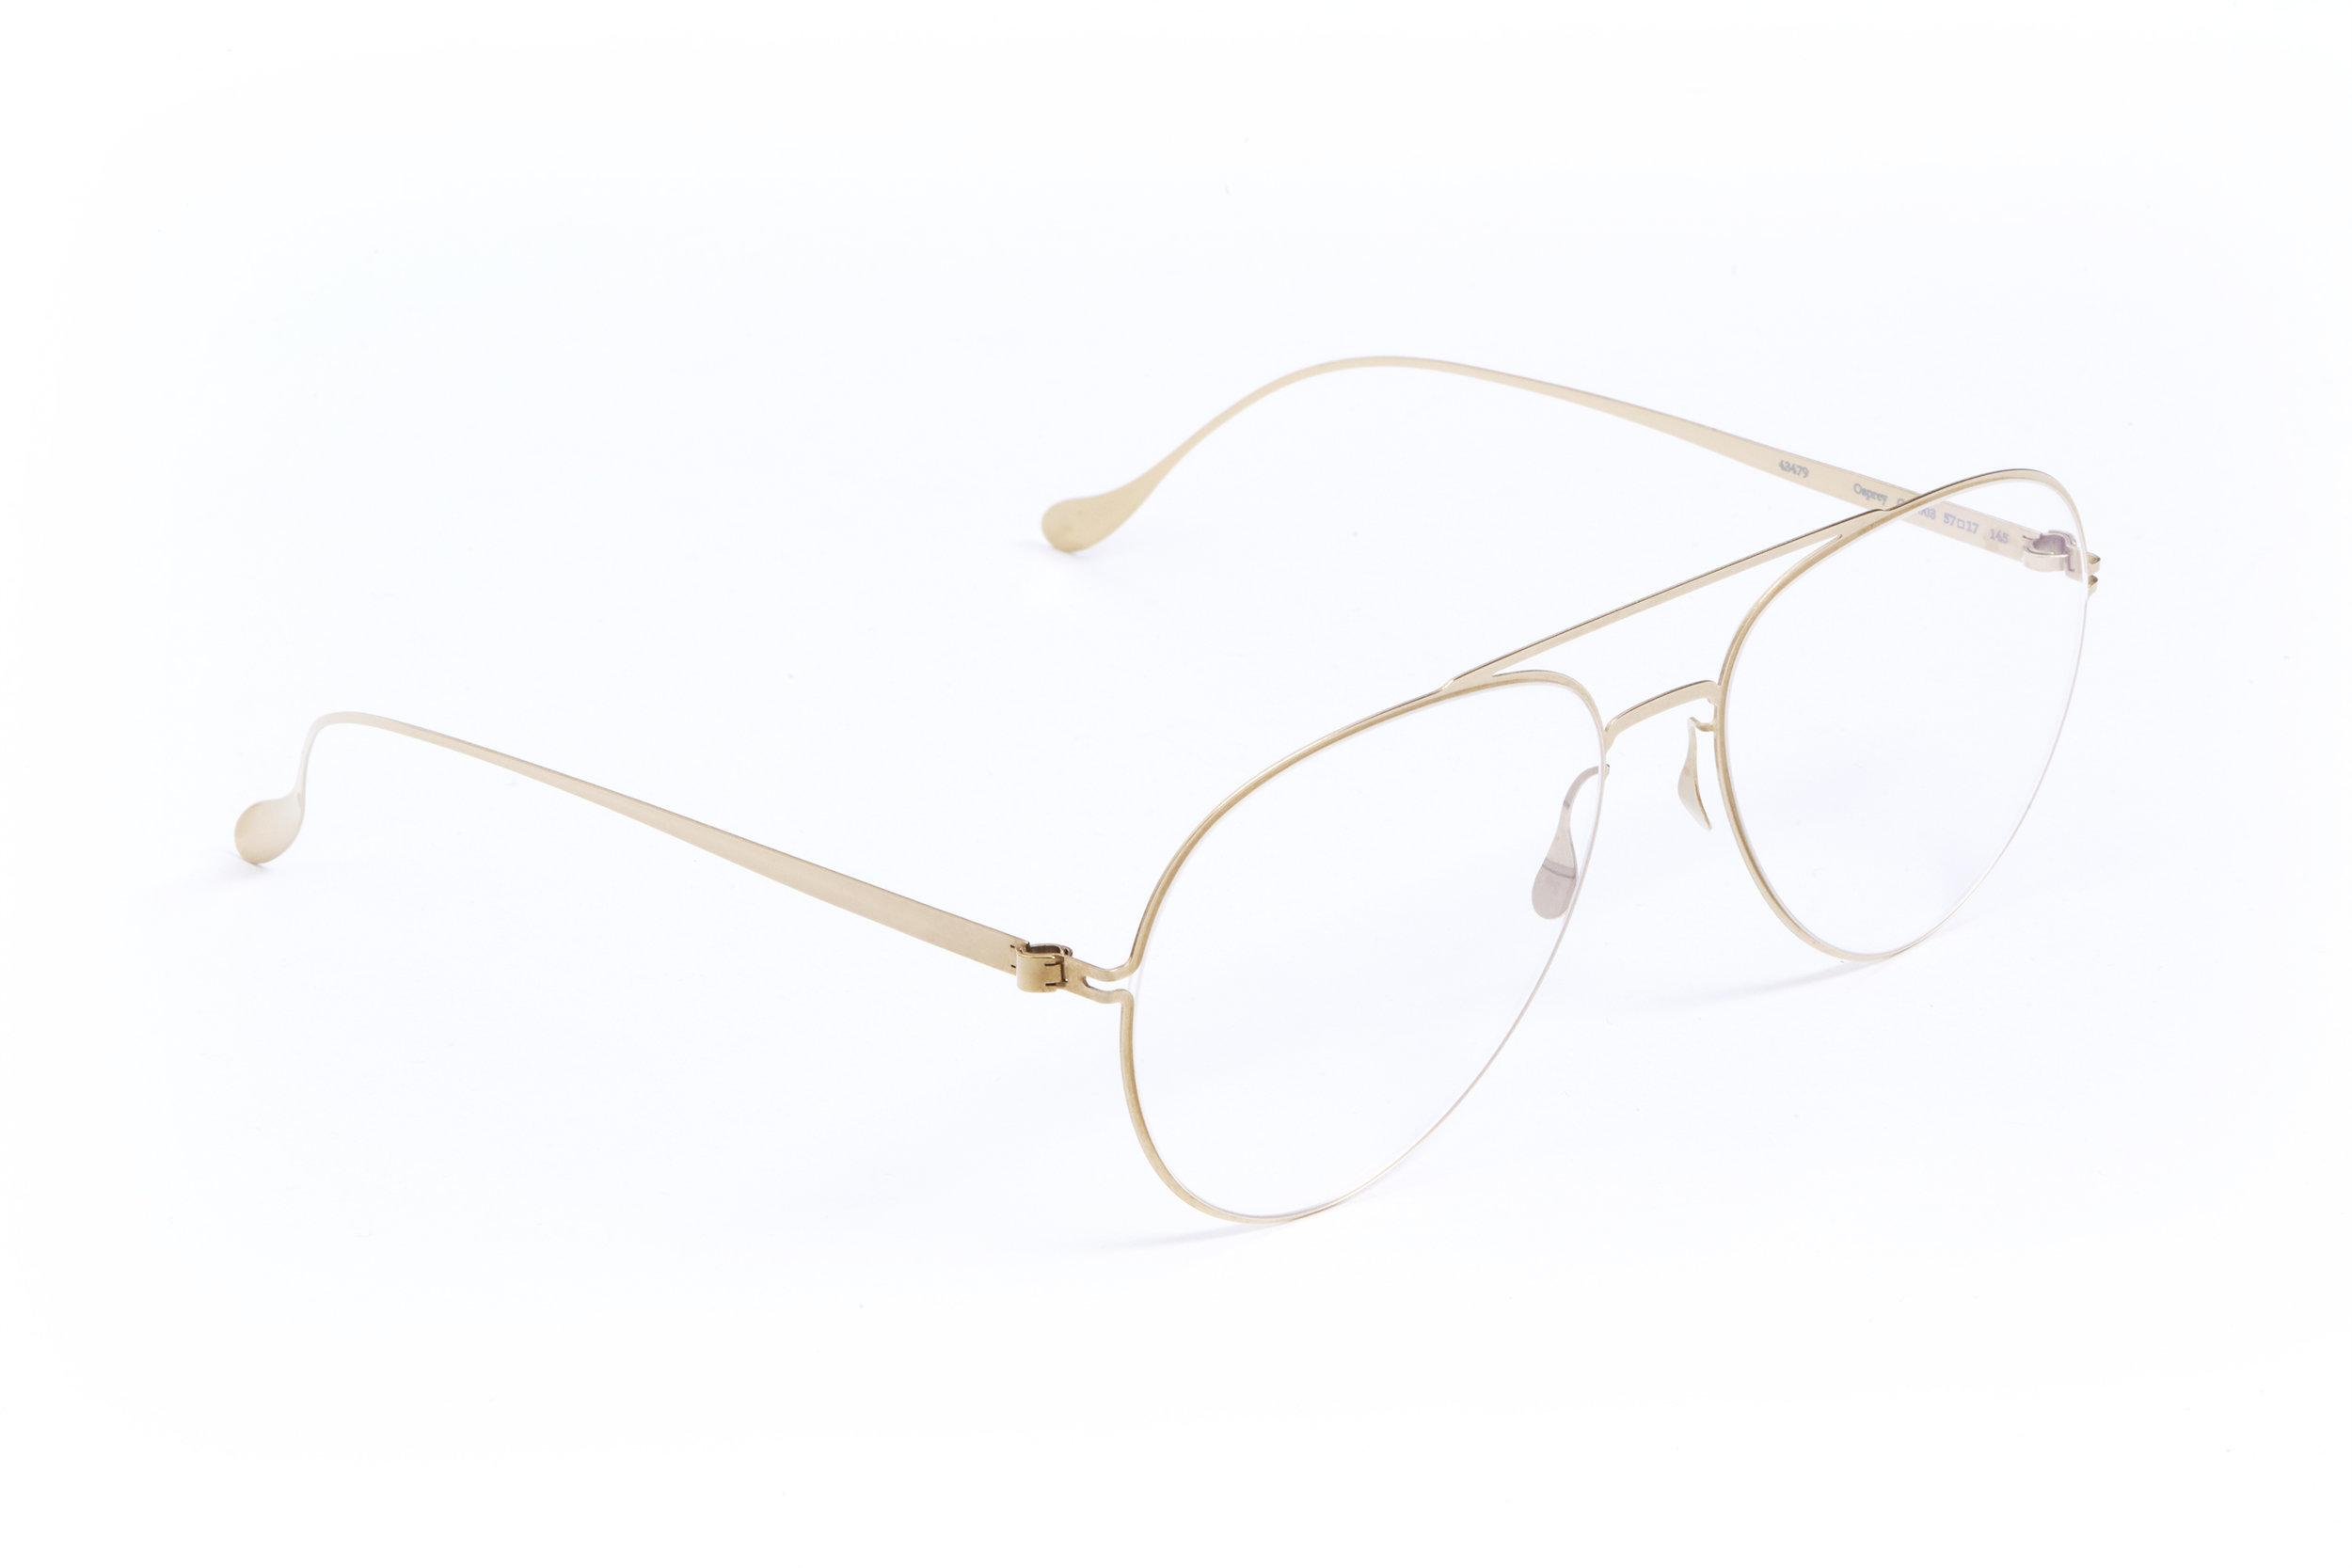 haffmans_neumeister_osprey_gold_clear_line_eyeglasses_angle_102427.jpg